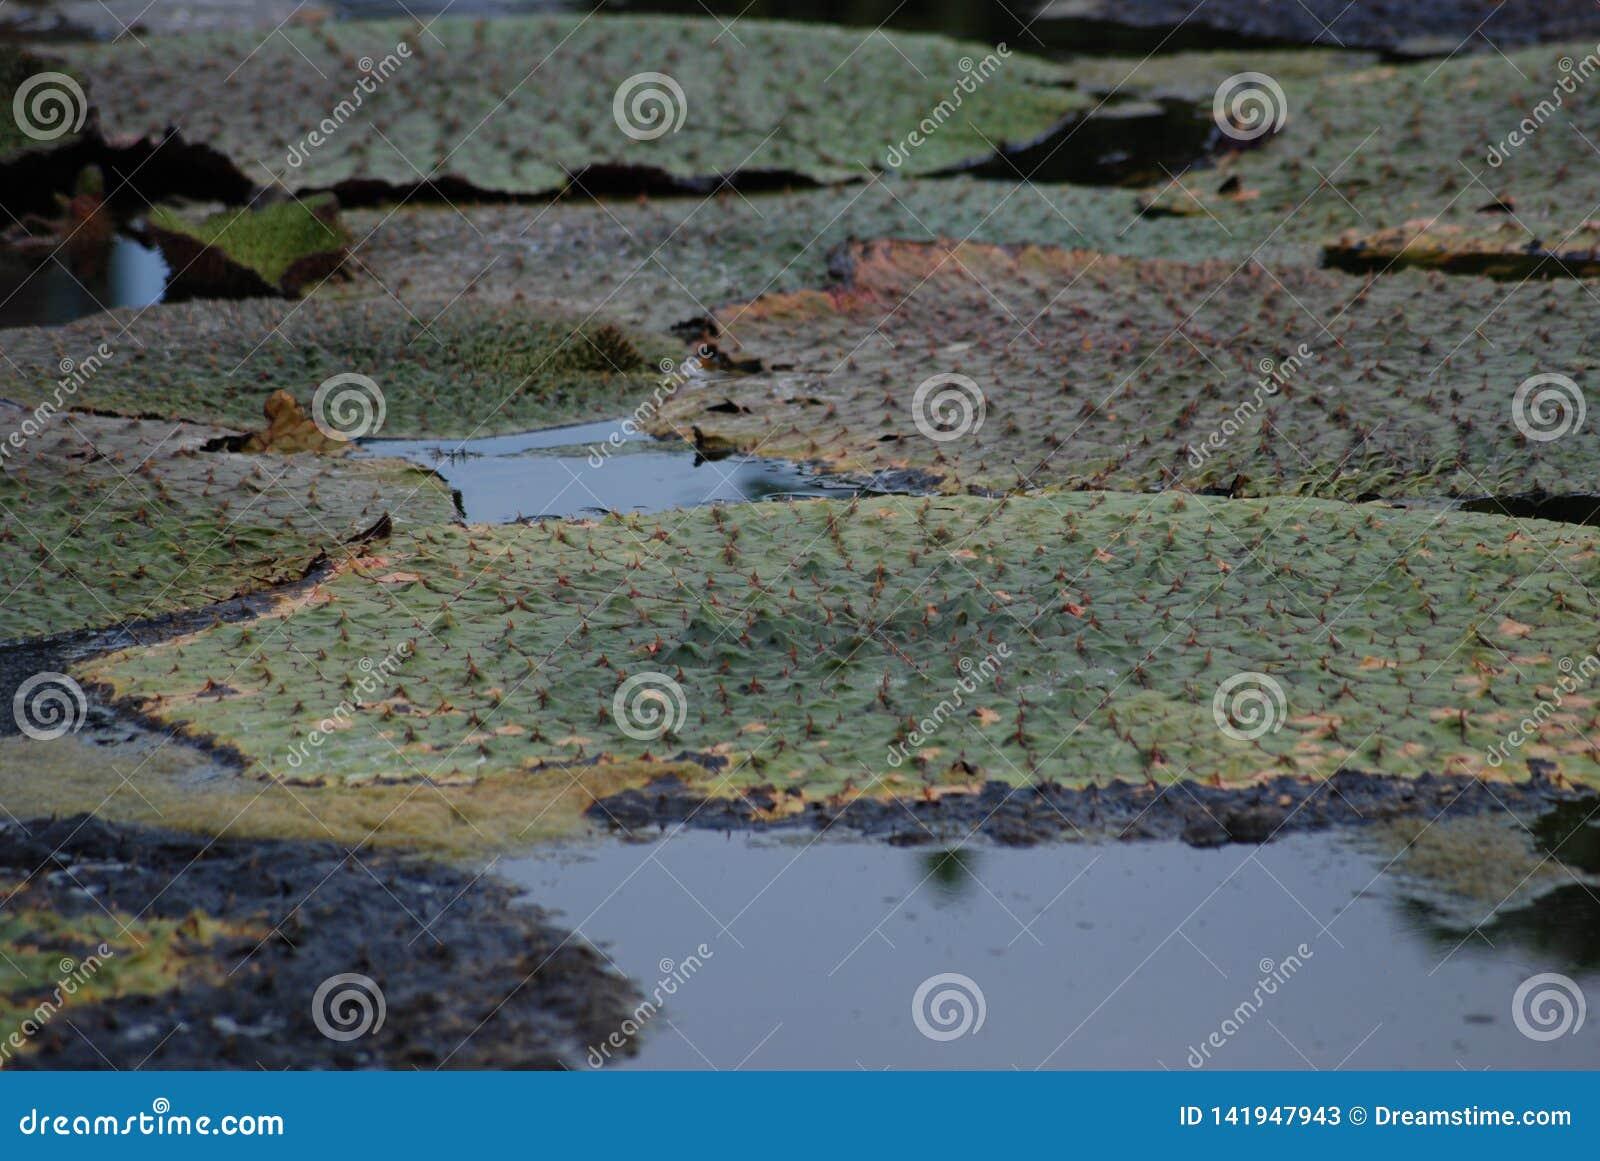 Água espinhosa Lily Euryale Leaves Floating na lagoa